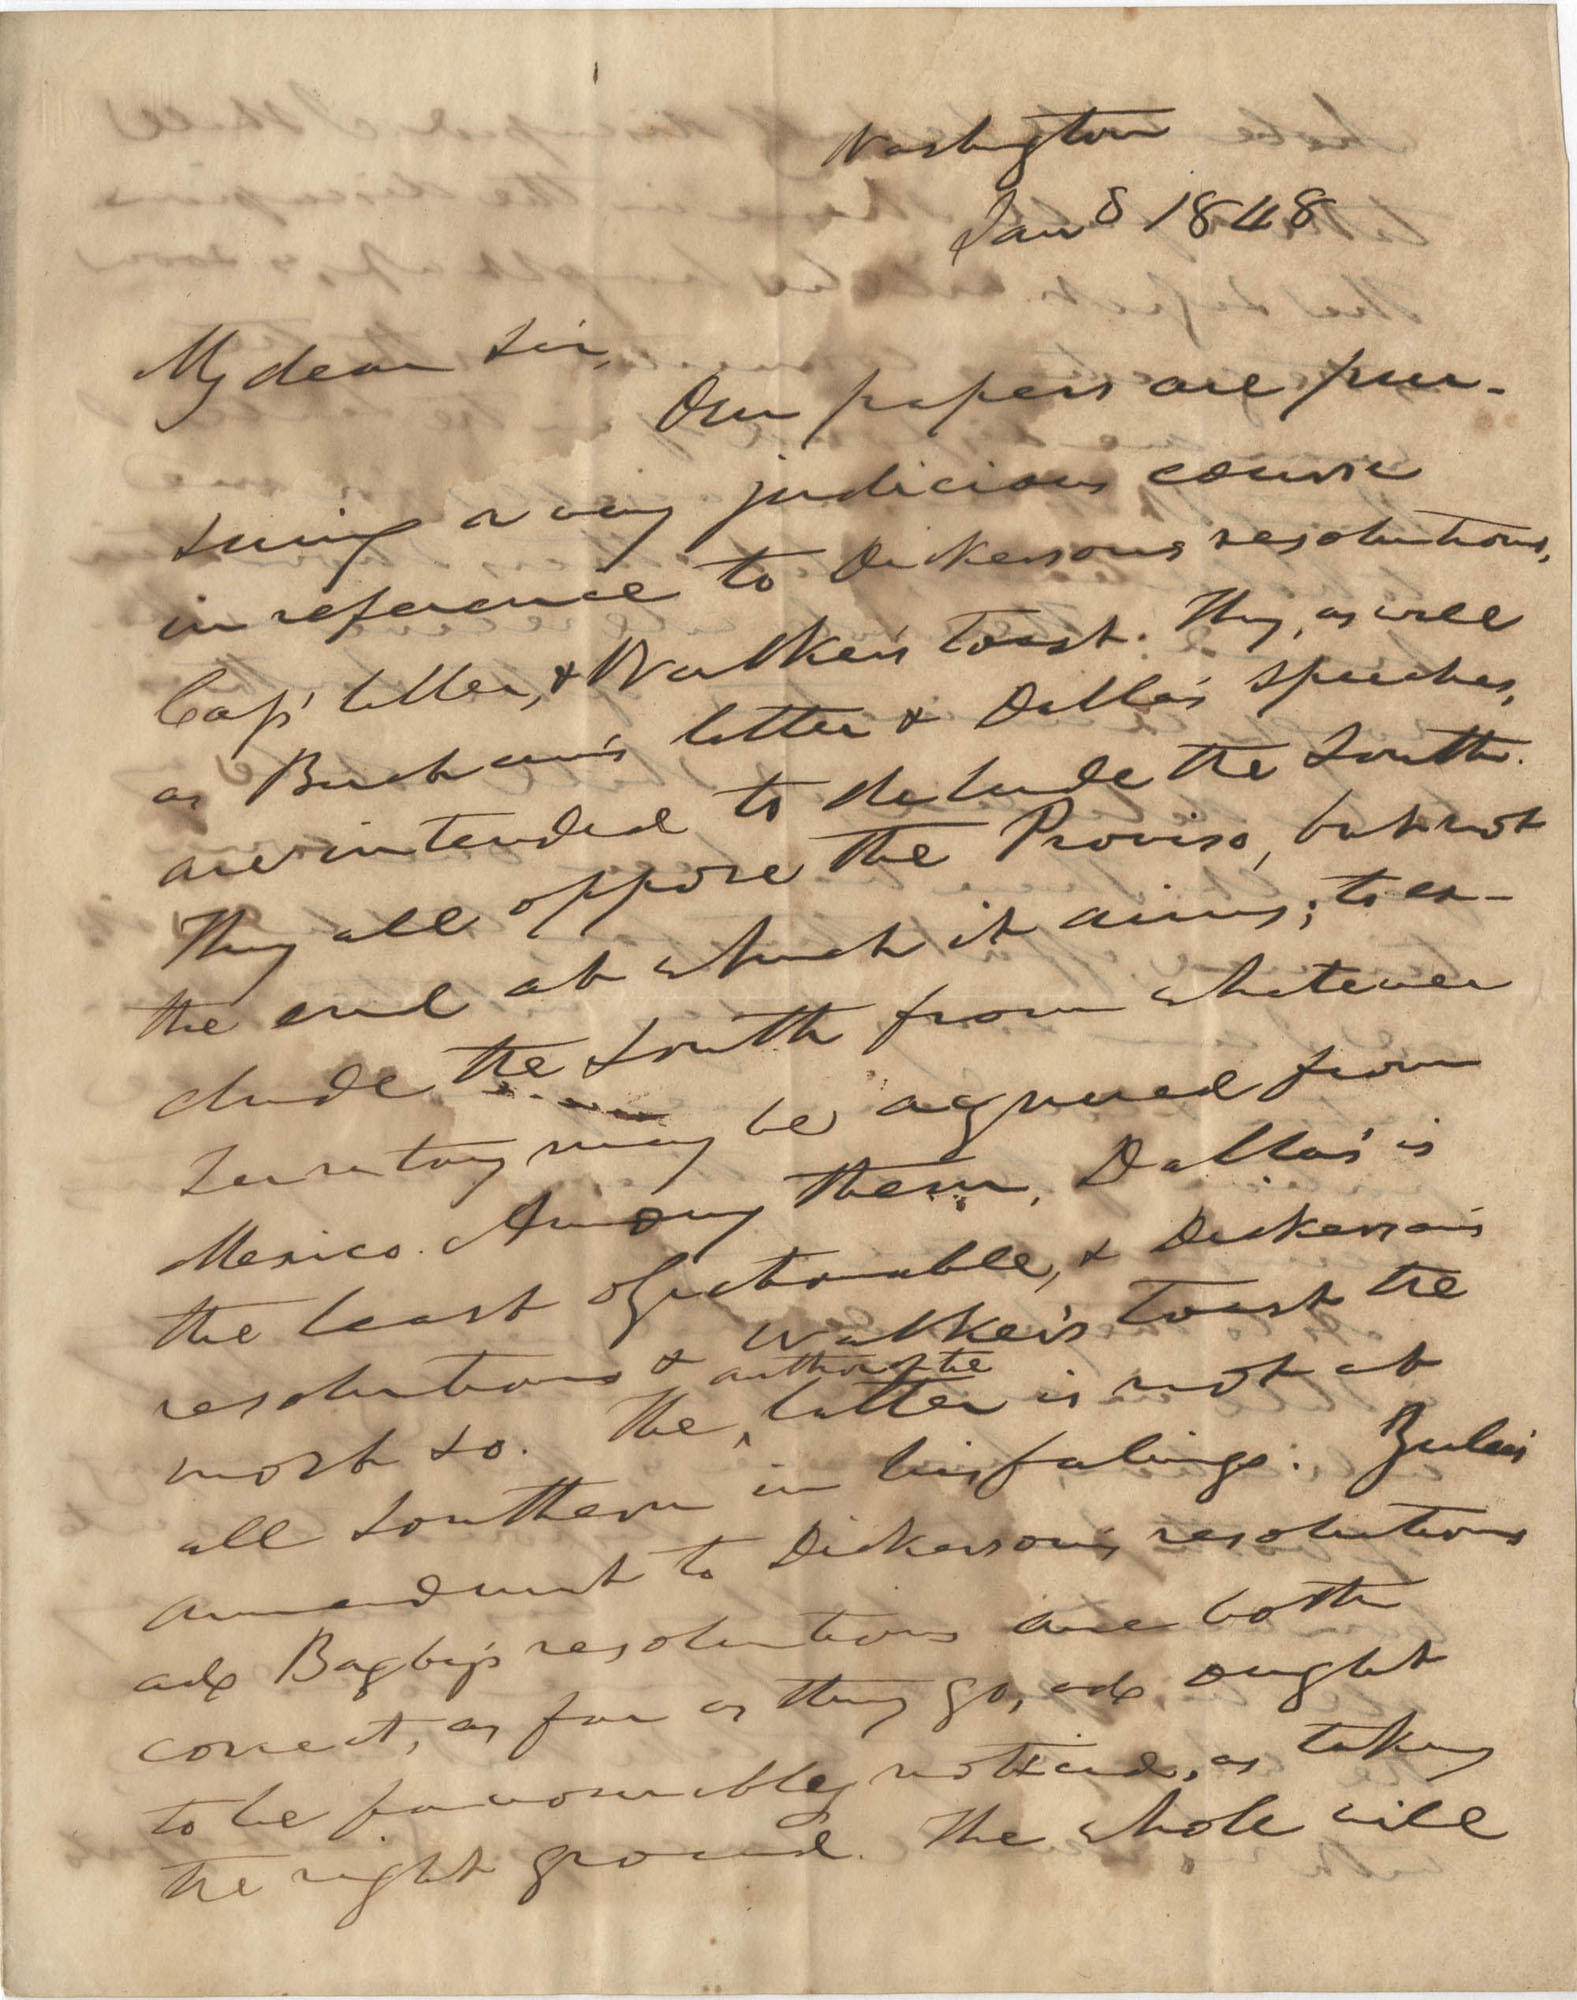 From John C. Calhoun to Henry [?]